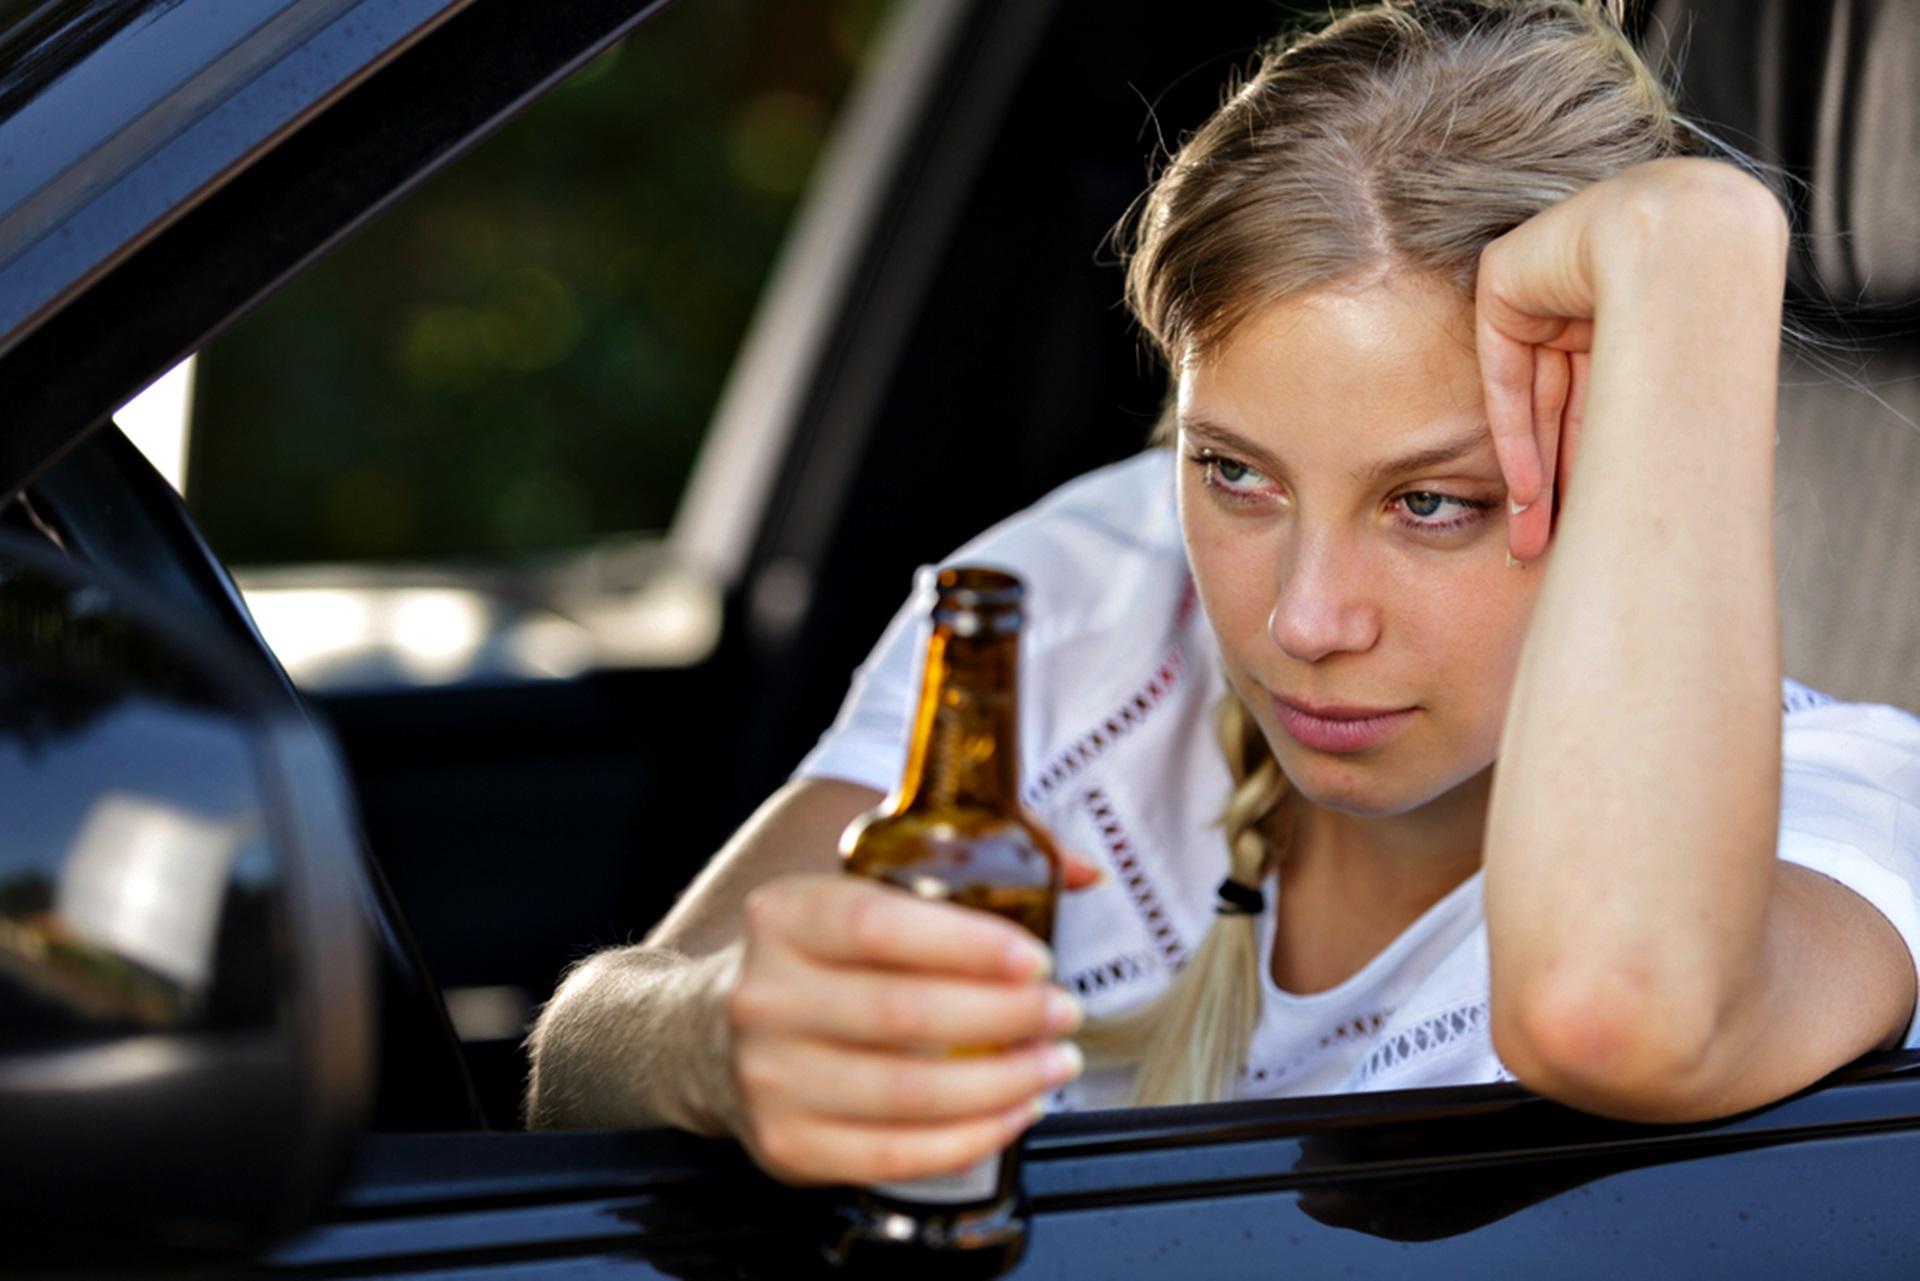 Test Alcohol Borracho Foto Fuente Dgt